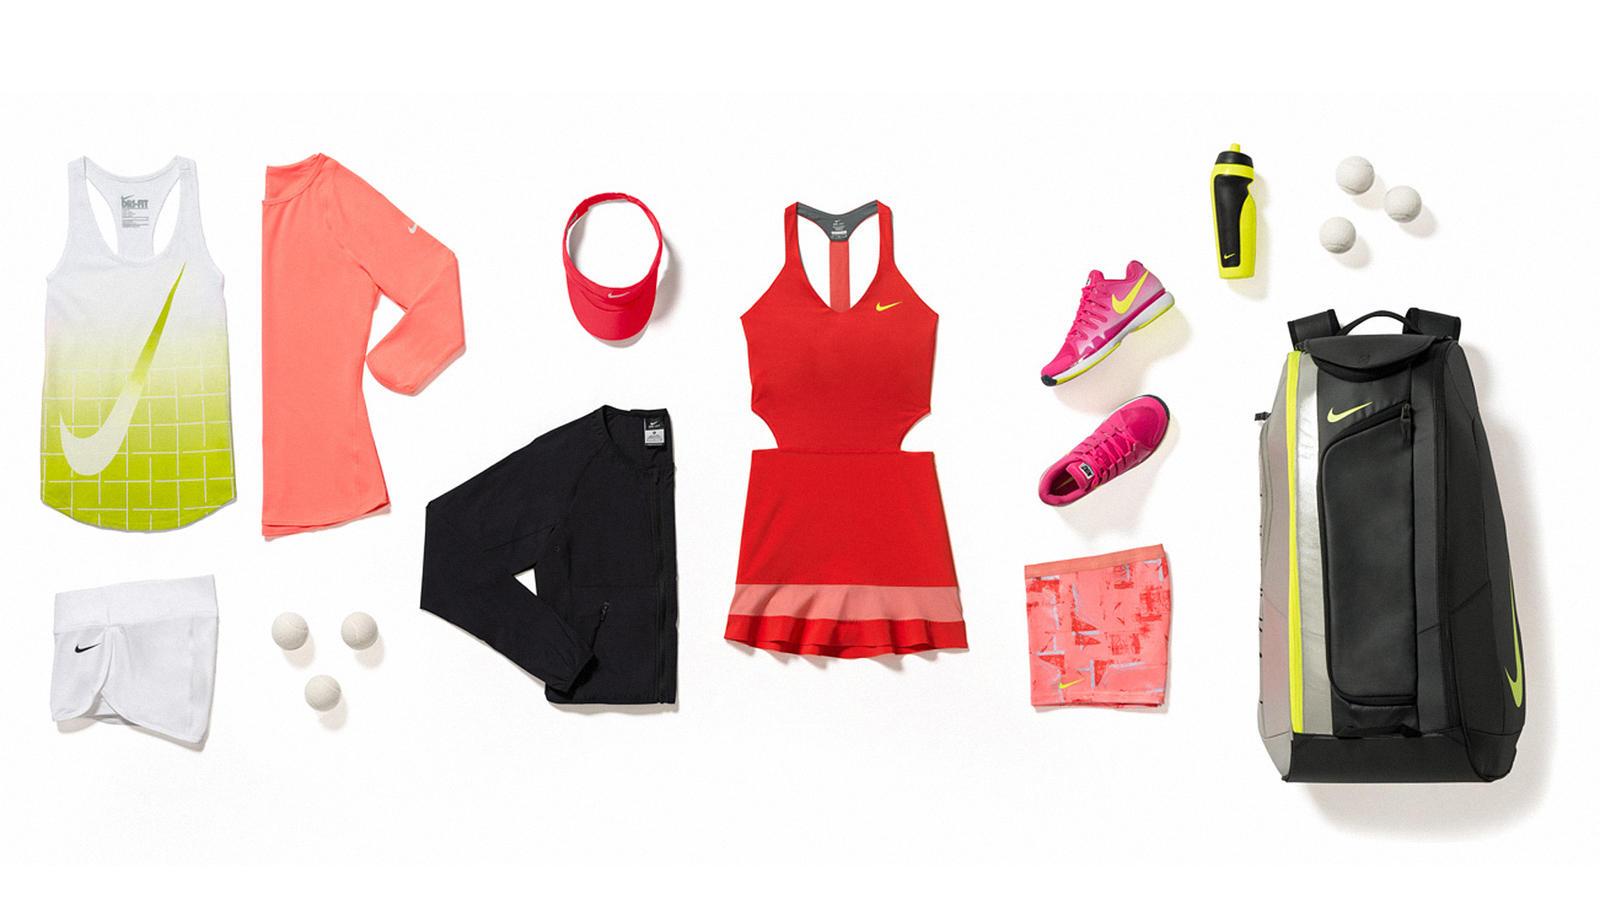 australian open 2015 maria sharapova nike tennis outfit dress